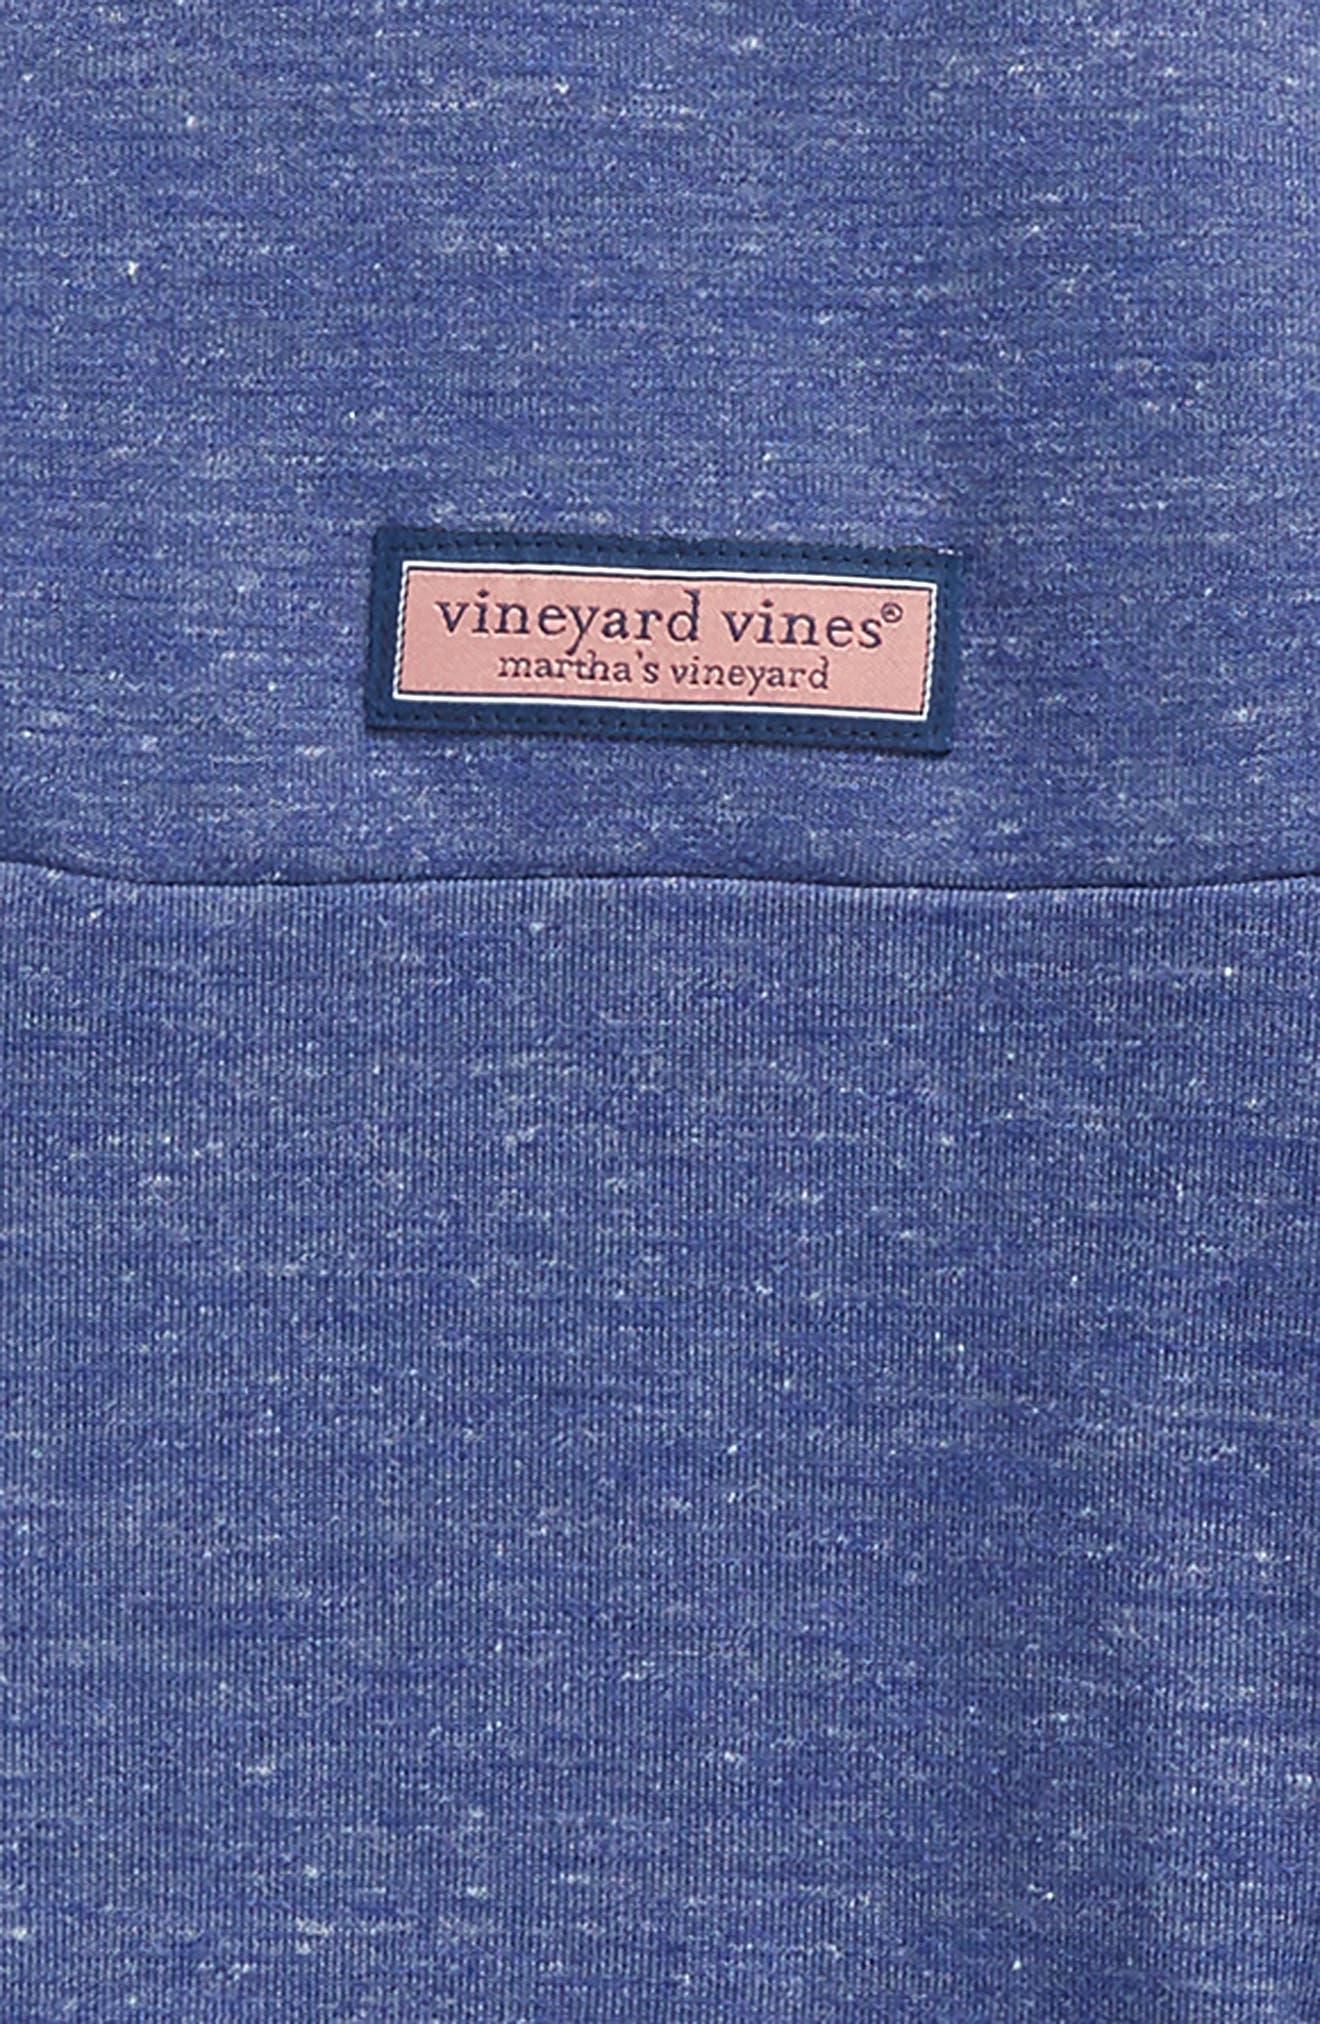 Alternate Image 2  - vineyard vines Mesh Shep Quarter Zip Pullover (Big Boys)